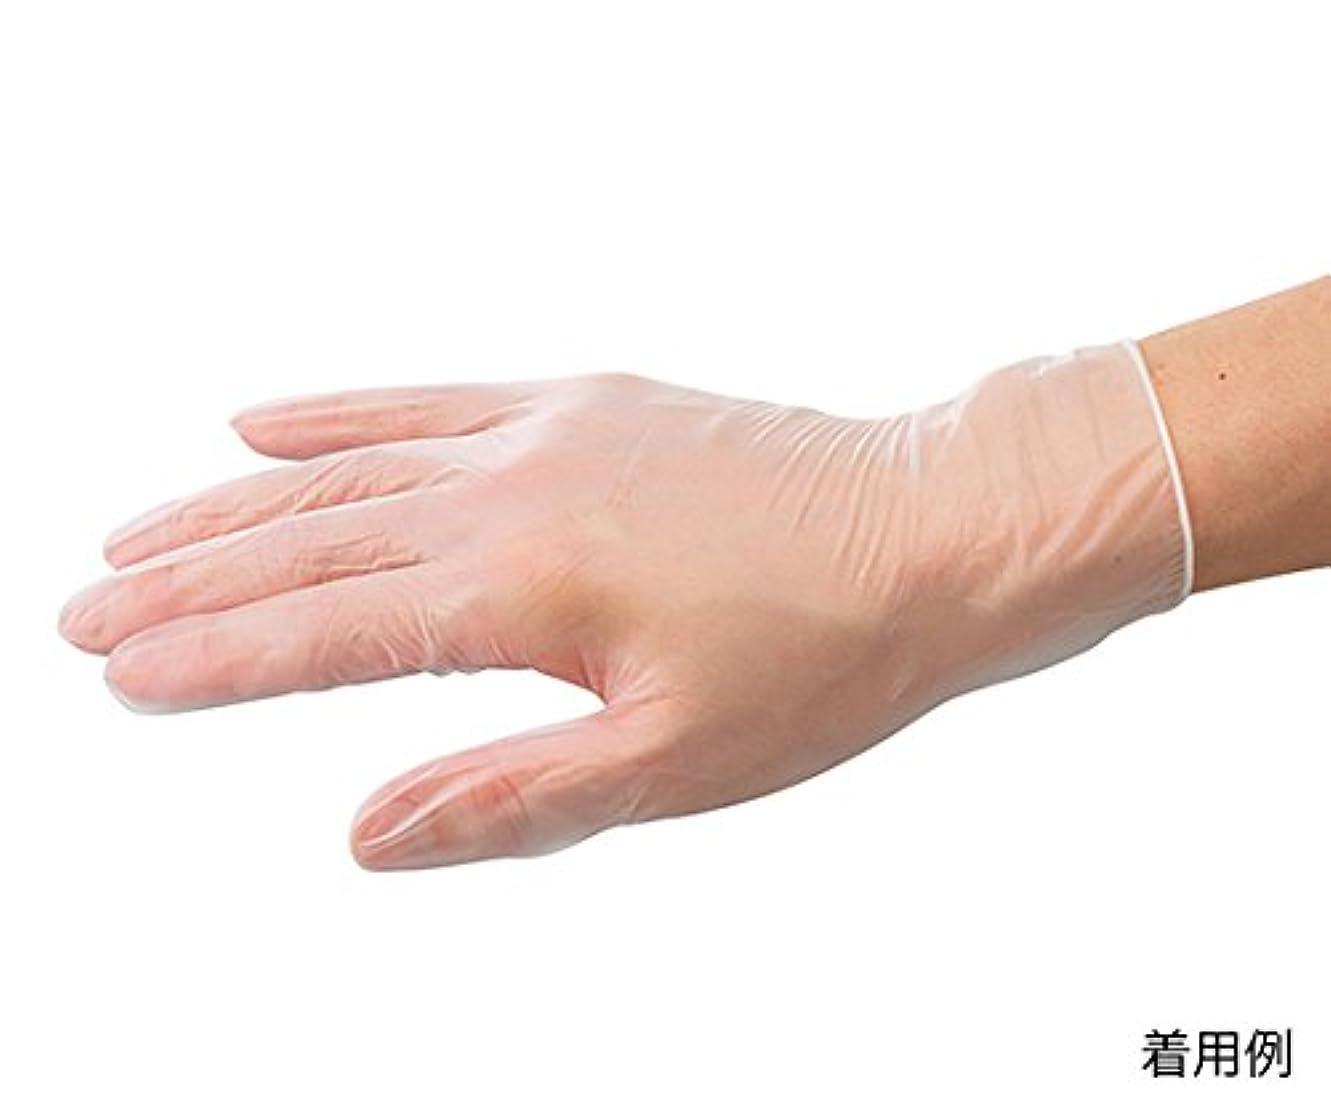 ARメディコム?インク?アジアリミテッド7-3726-01バイタルプラスチック手袋(パウダーフリー)S150枚入